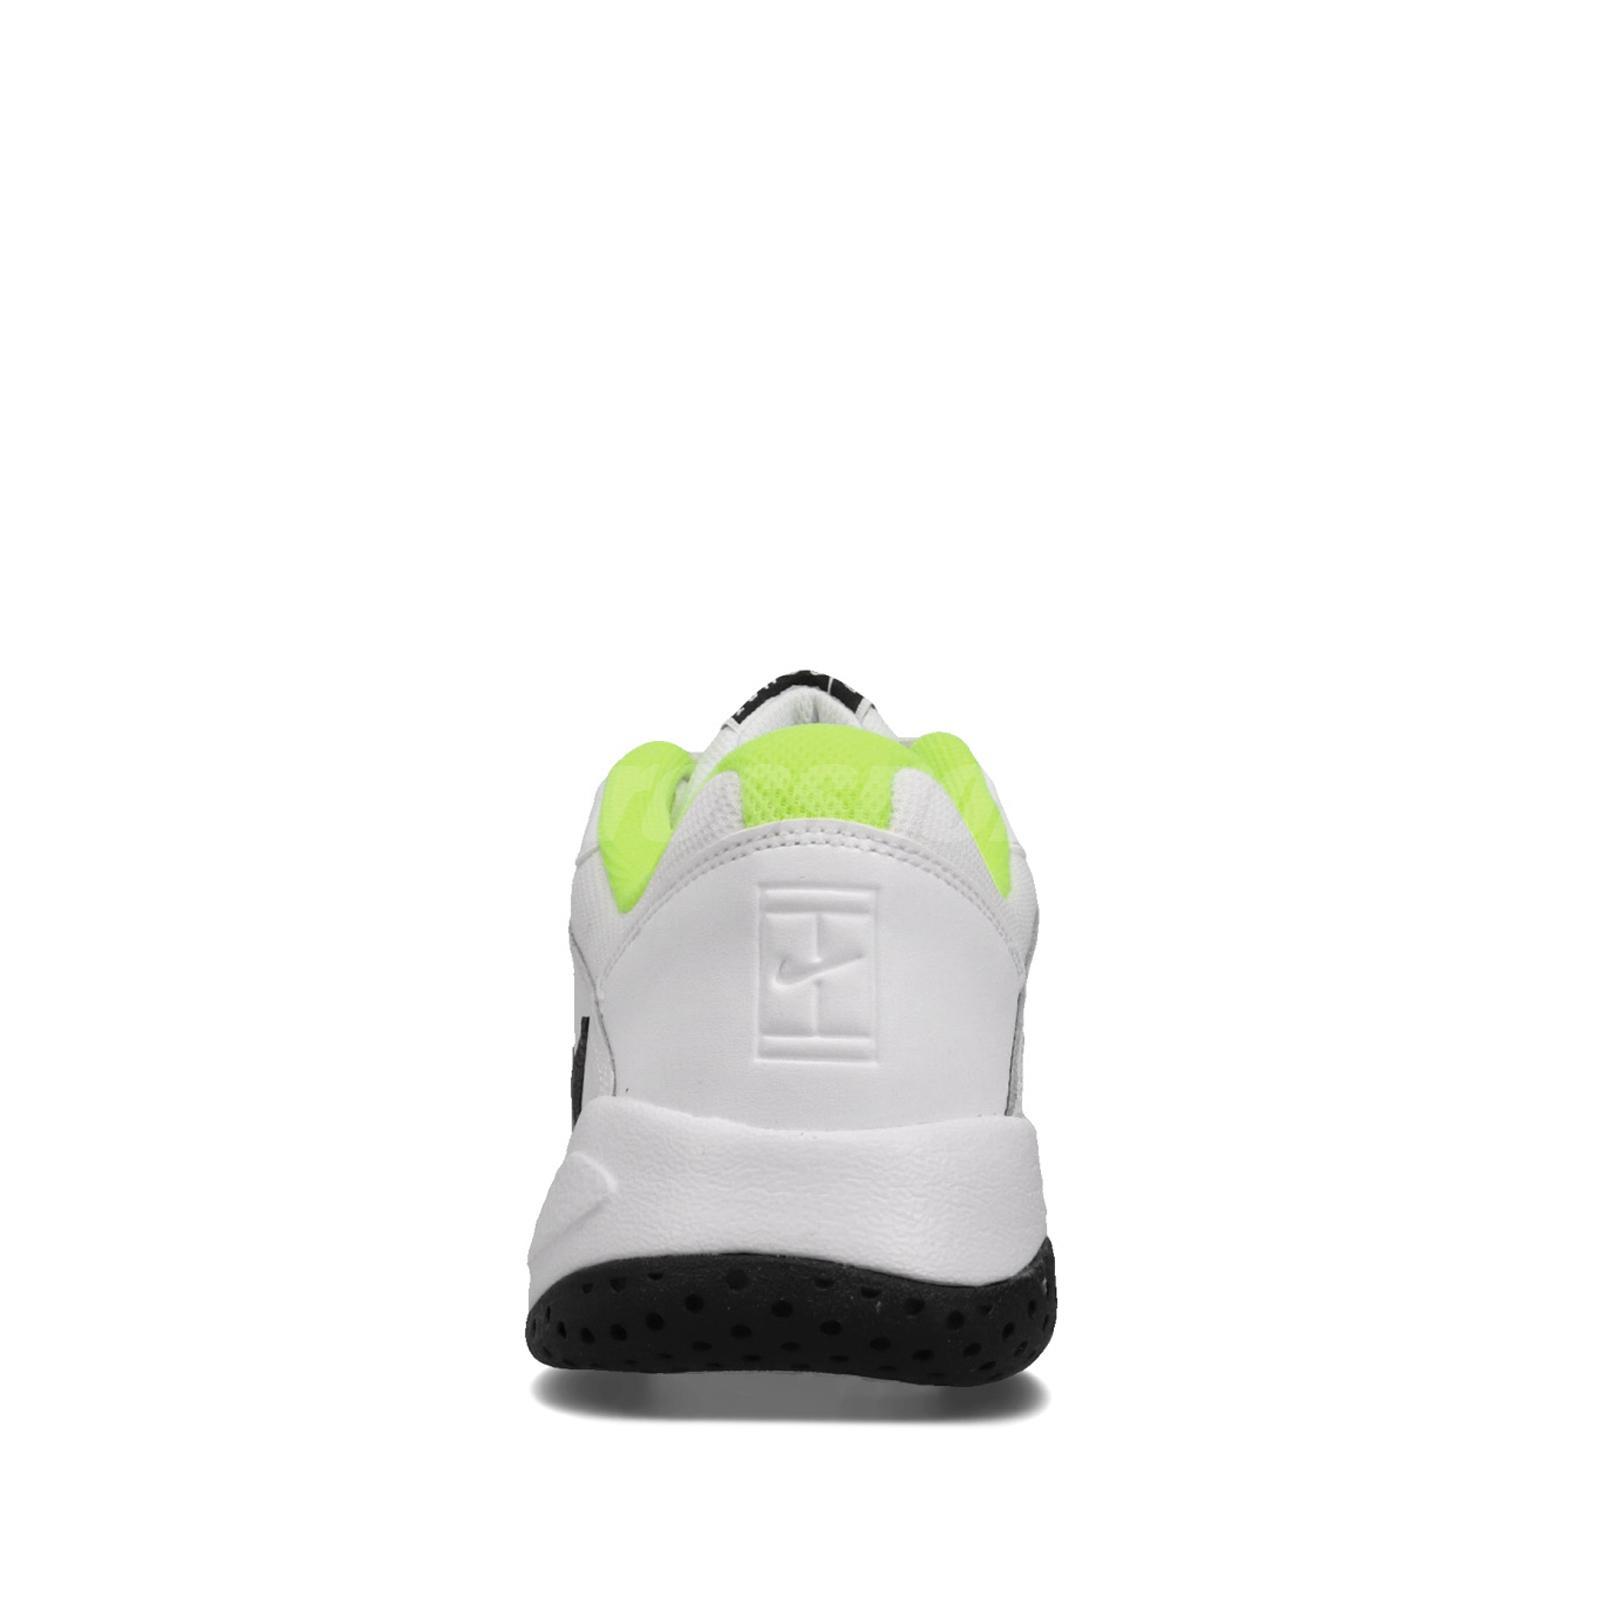 Nike Court Lite 2 White Black Volt Men Tennis Shoes Sneakers Trainers AR8836-107